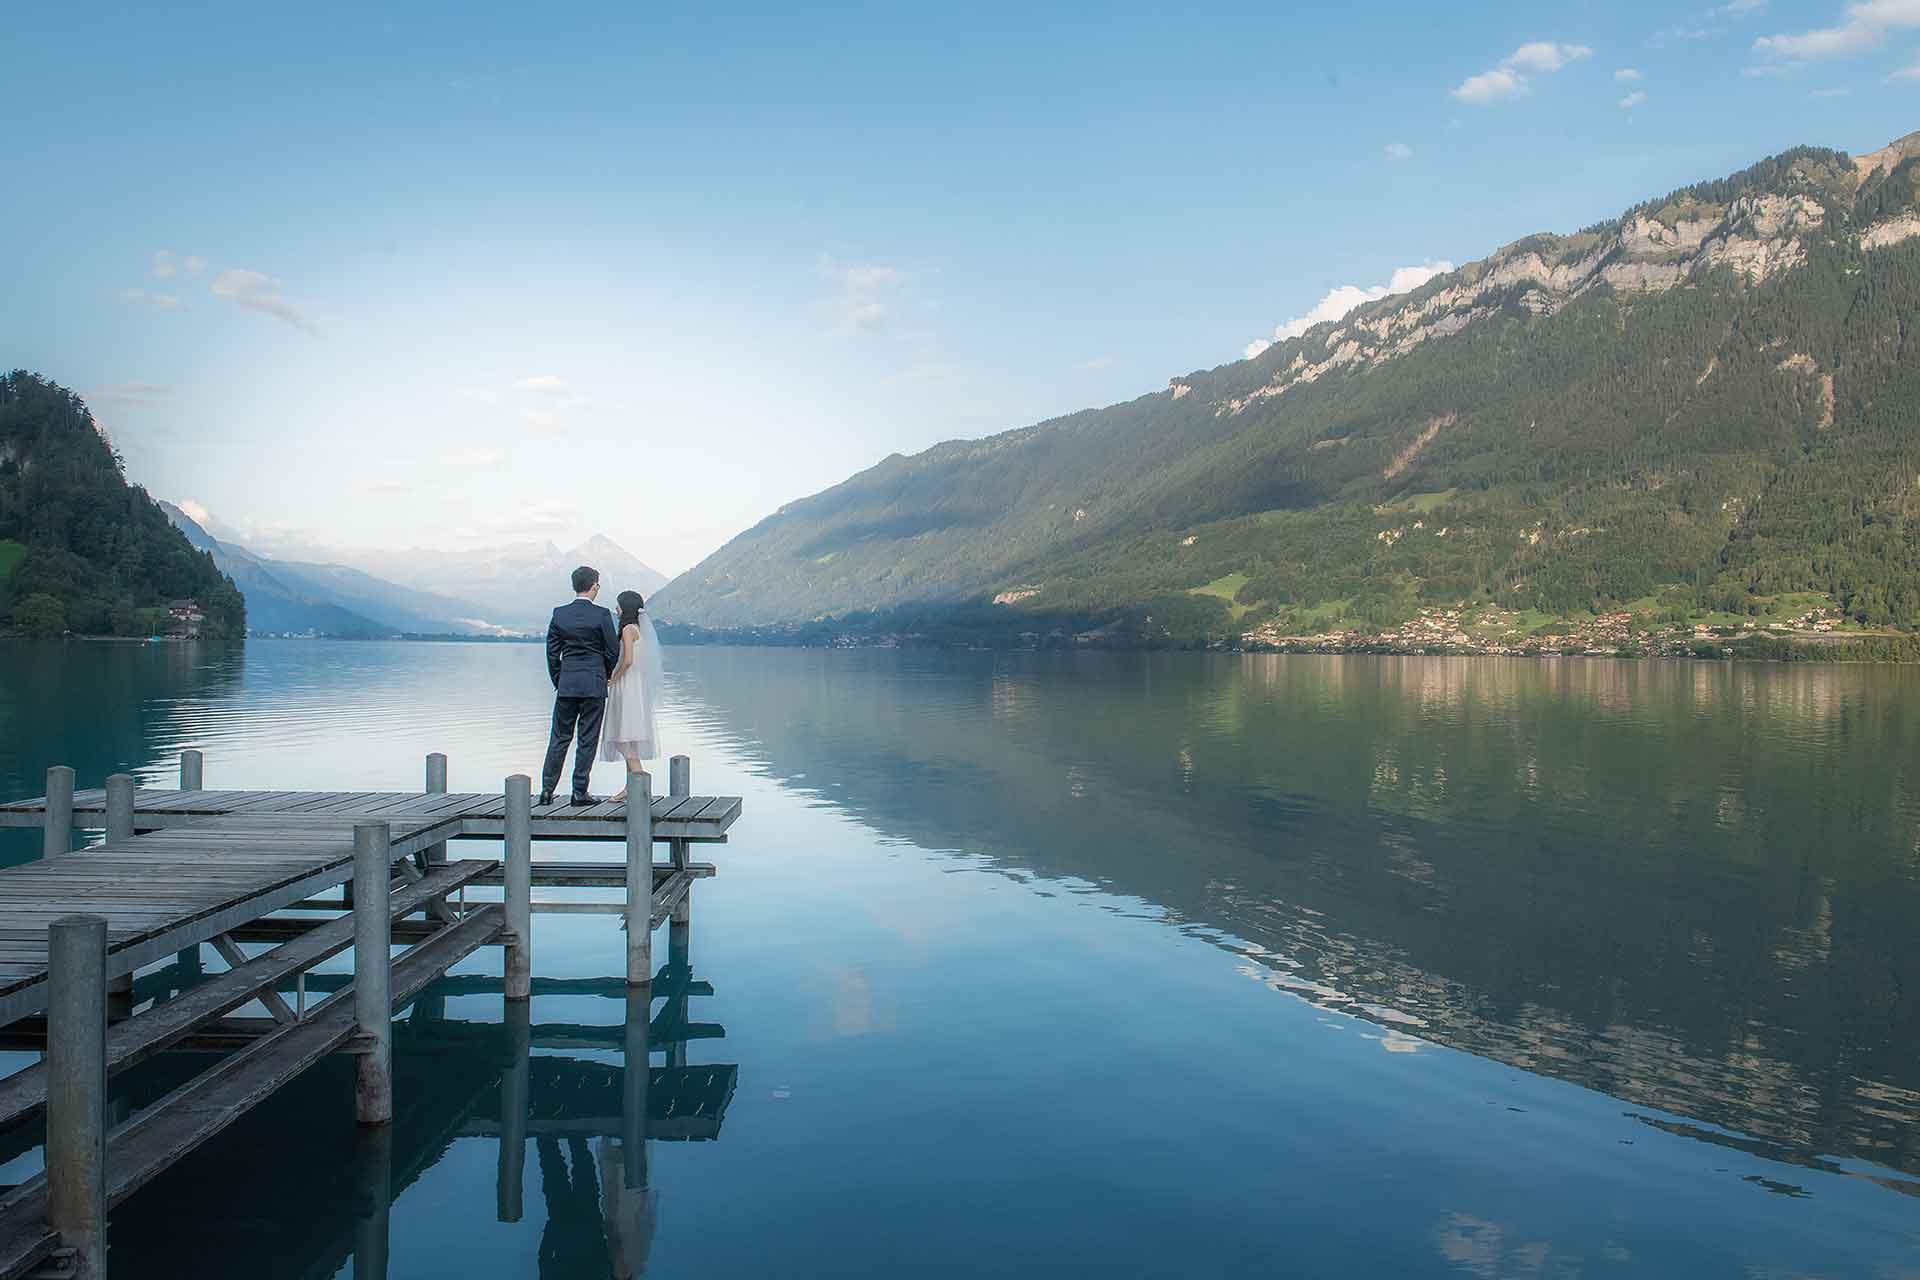 Pre Wedding Photo Shoot in Swiss Alps